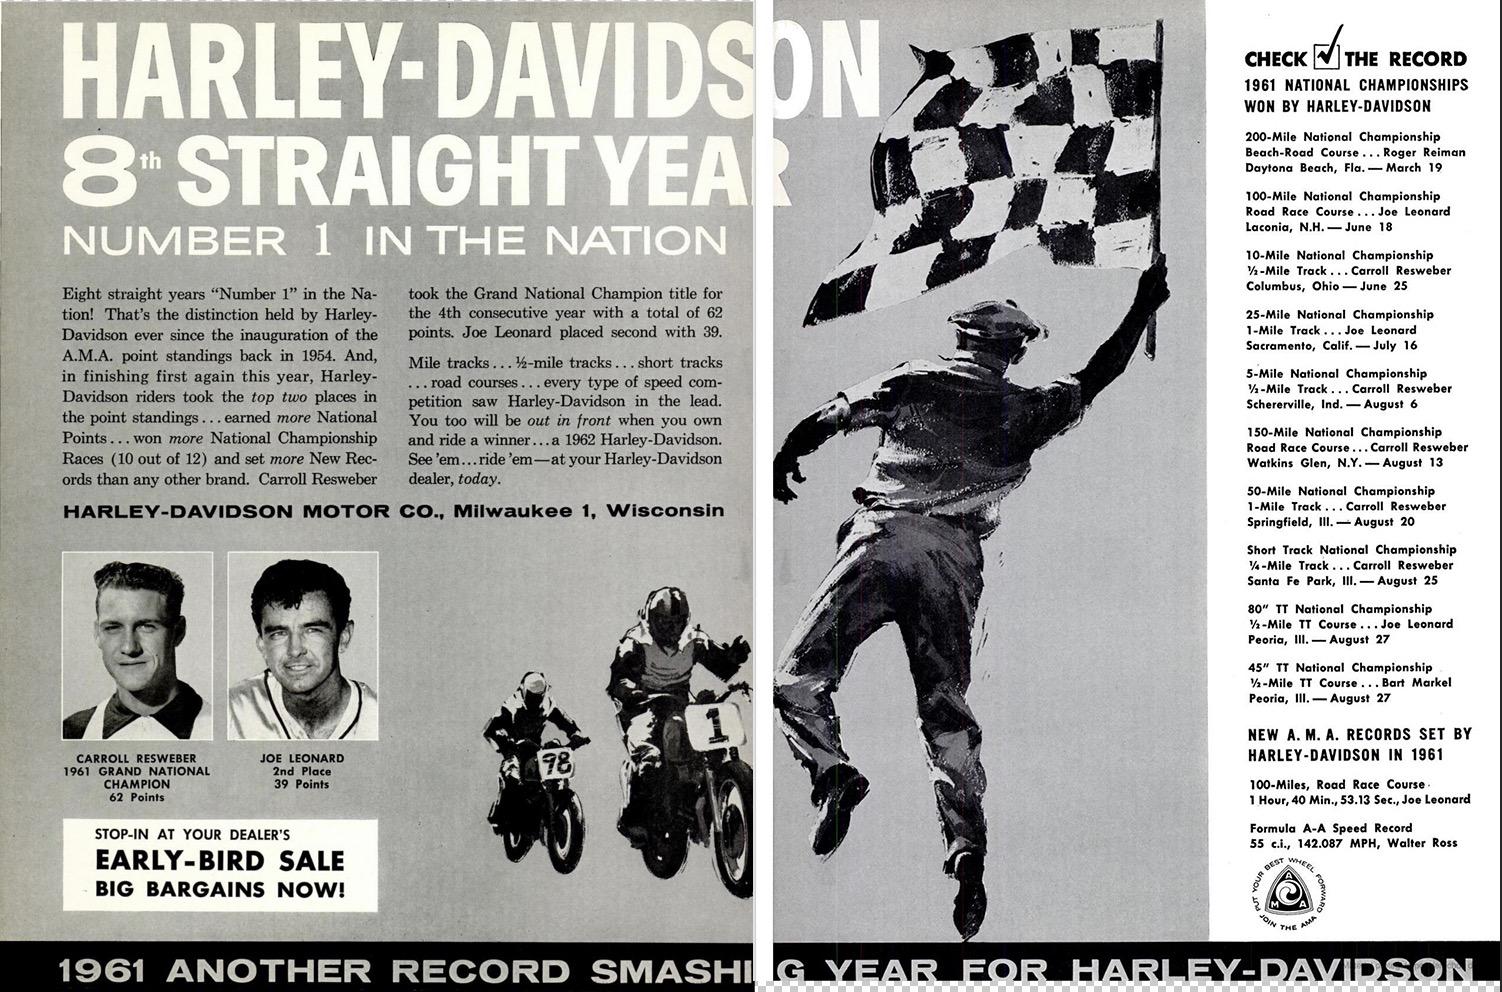 1962 - Harley-Davidson - 8 straight year